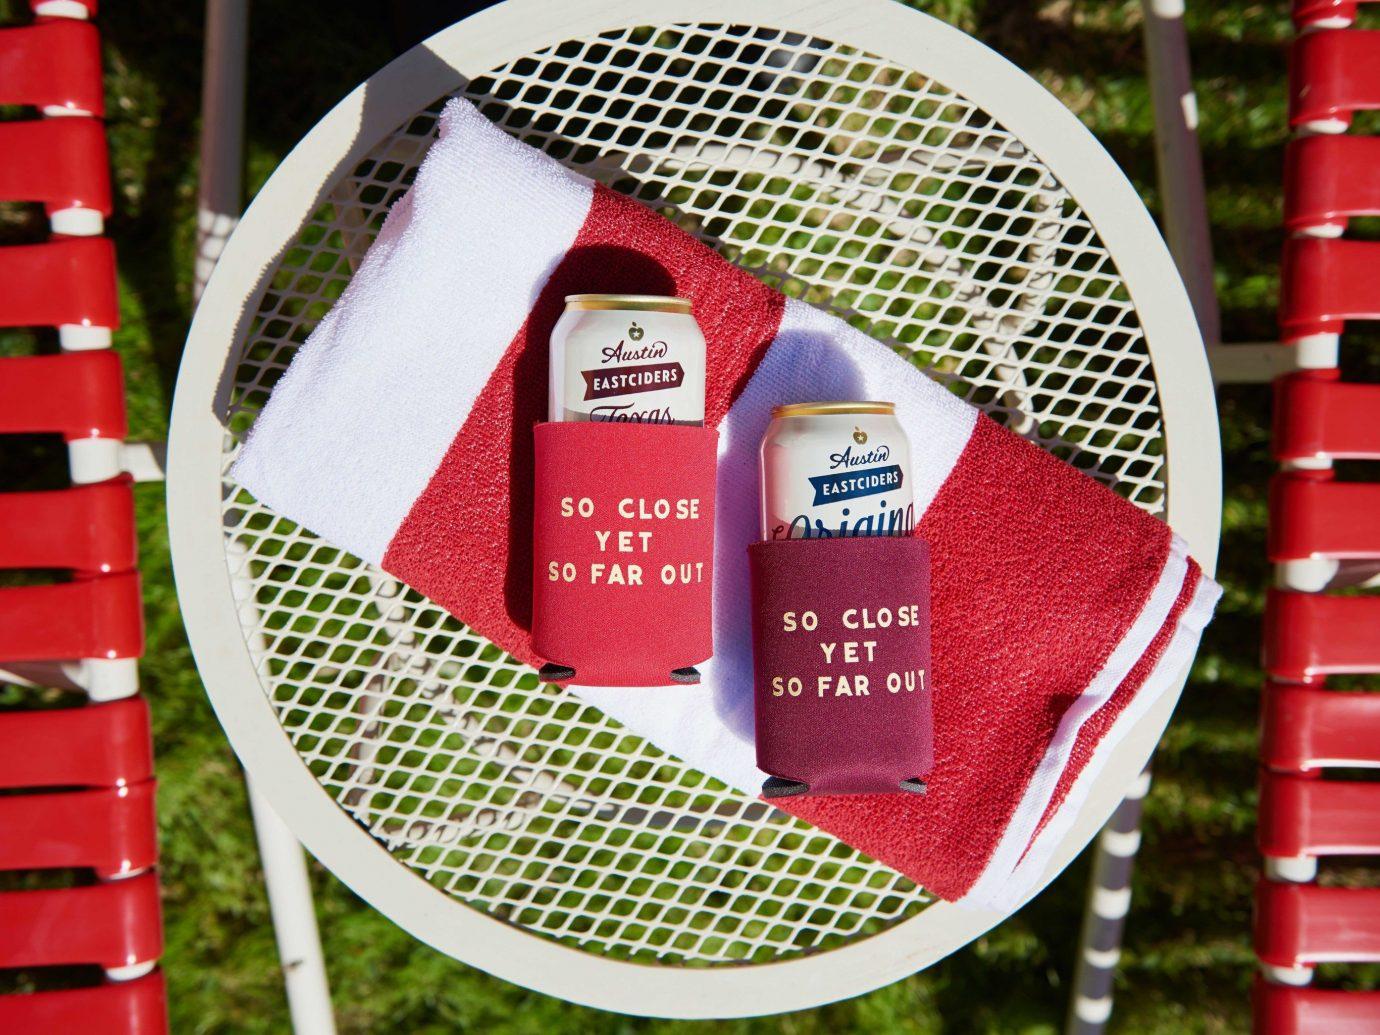 Austin Girls Getaways Texas Trip Ideas Weekend Getaways chair red cloth product grass seat recreation